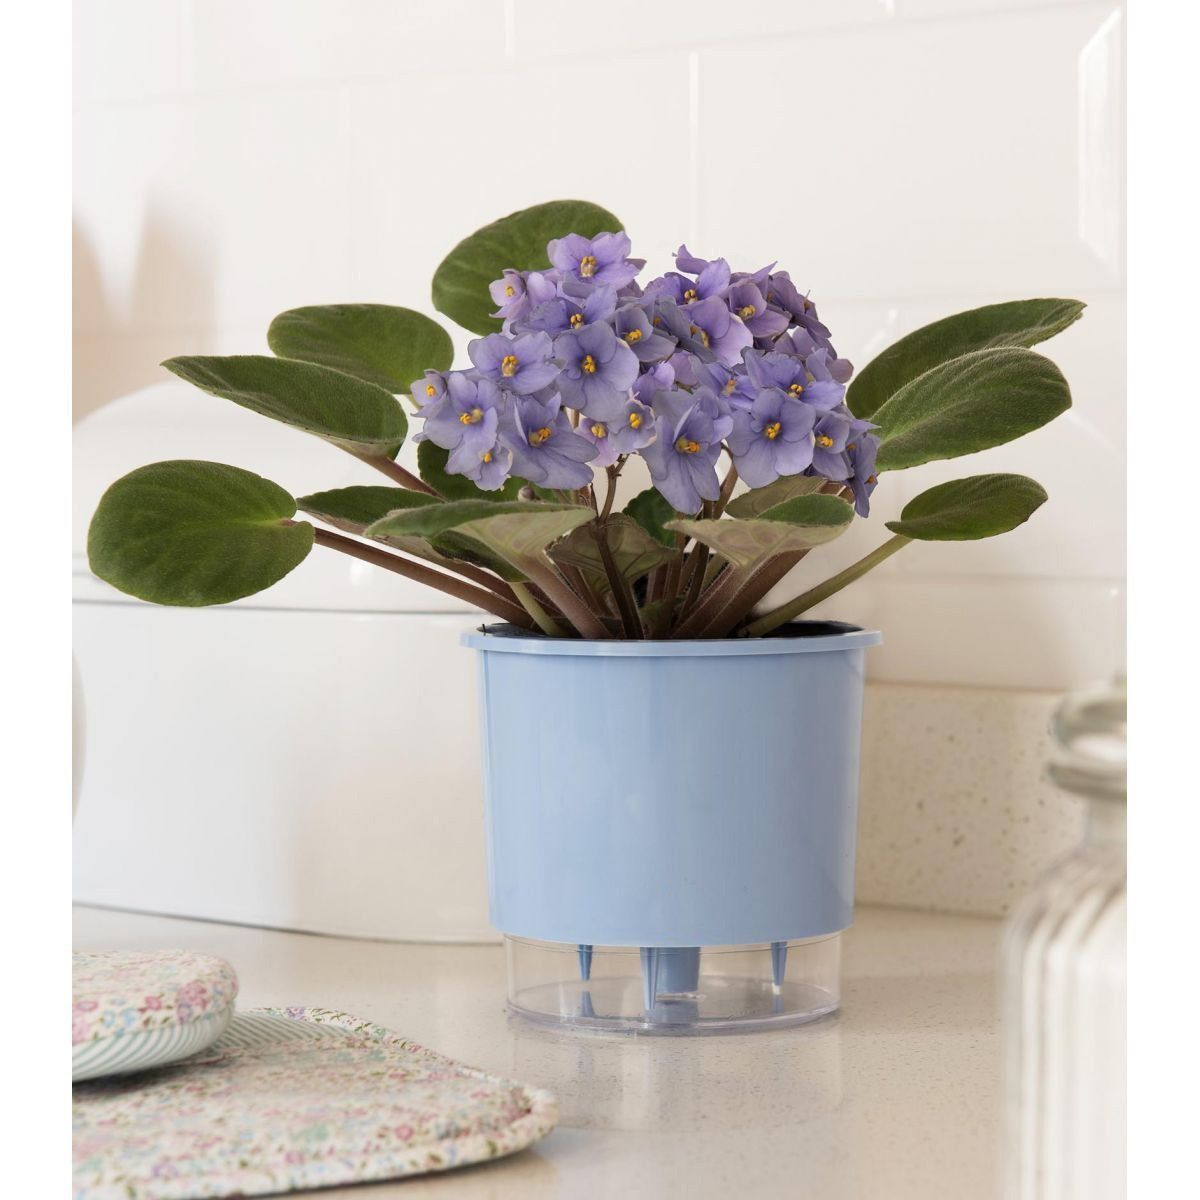 Vaso Autoirrigável Pequeno N02 12 cm x 11 cm Azul Serenity Linha Wishes